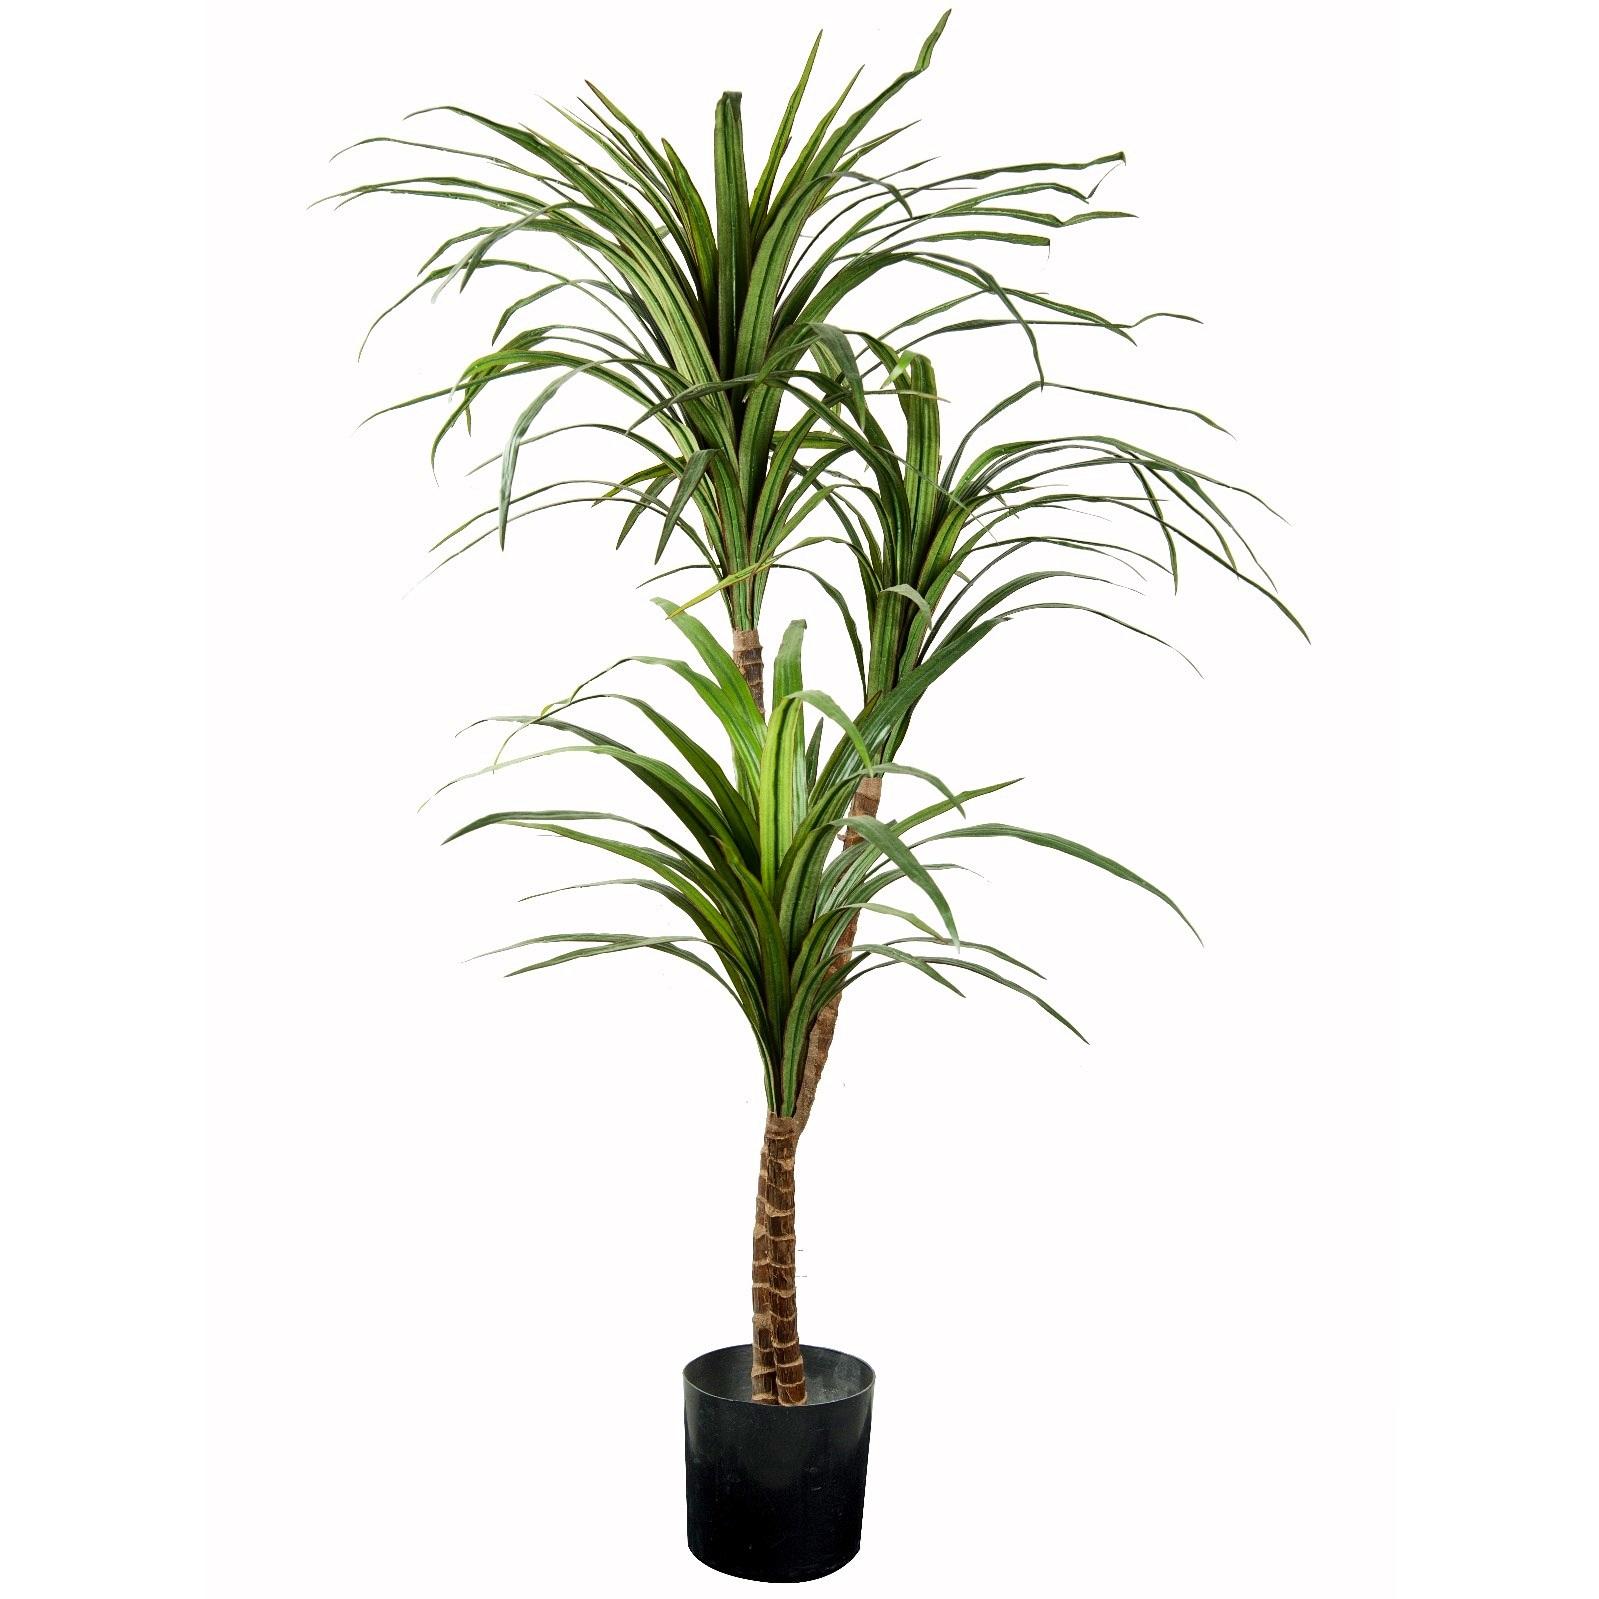 Dracaena Fragrans Tree Small Artificial Plants